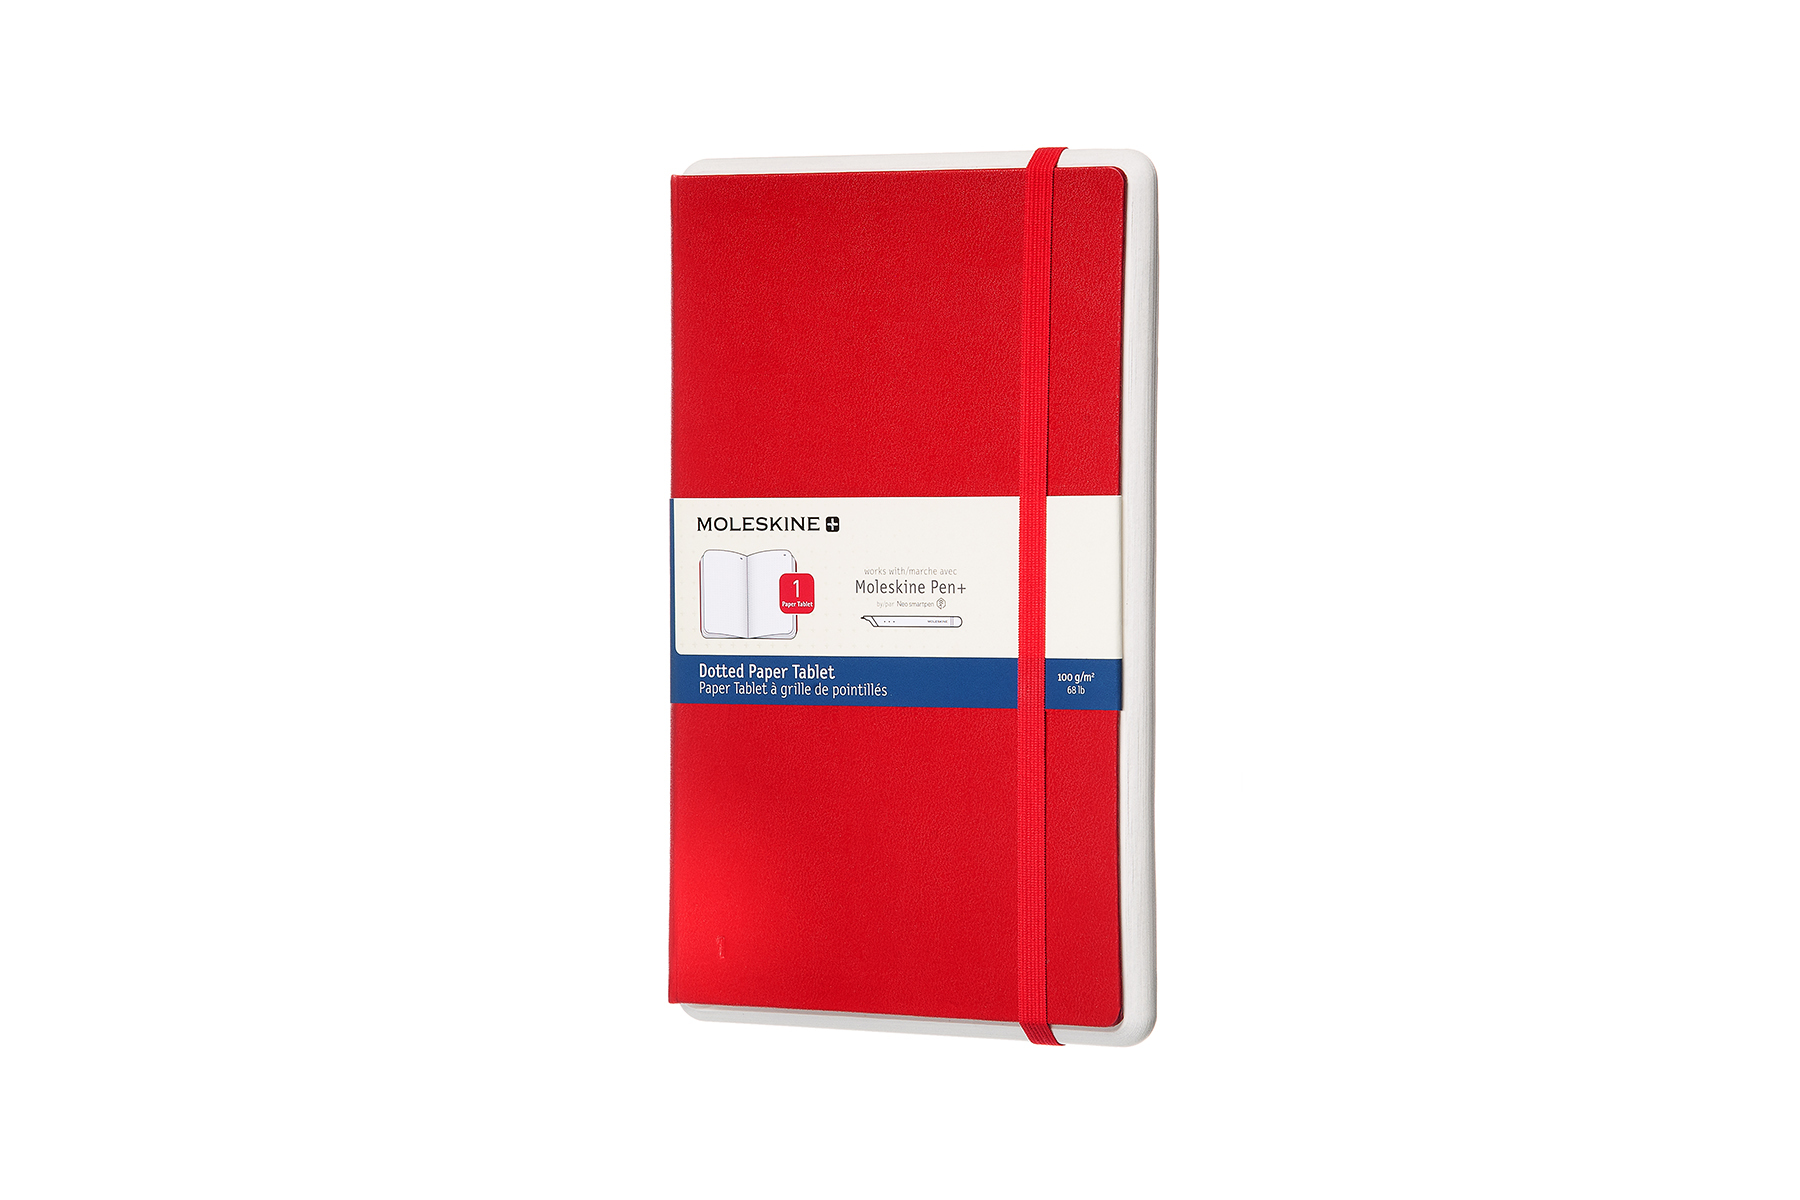 Moleskine PTNL34HF201 writing notebook Red 176 sheets